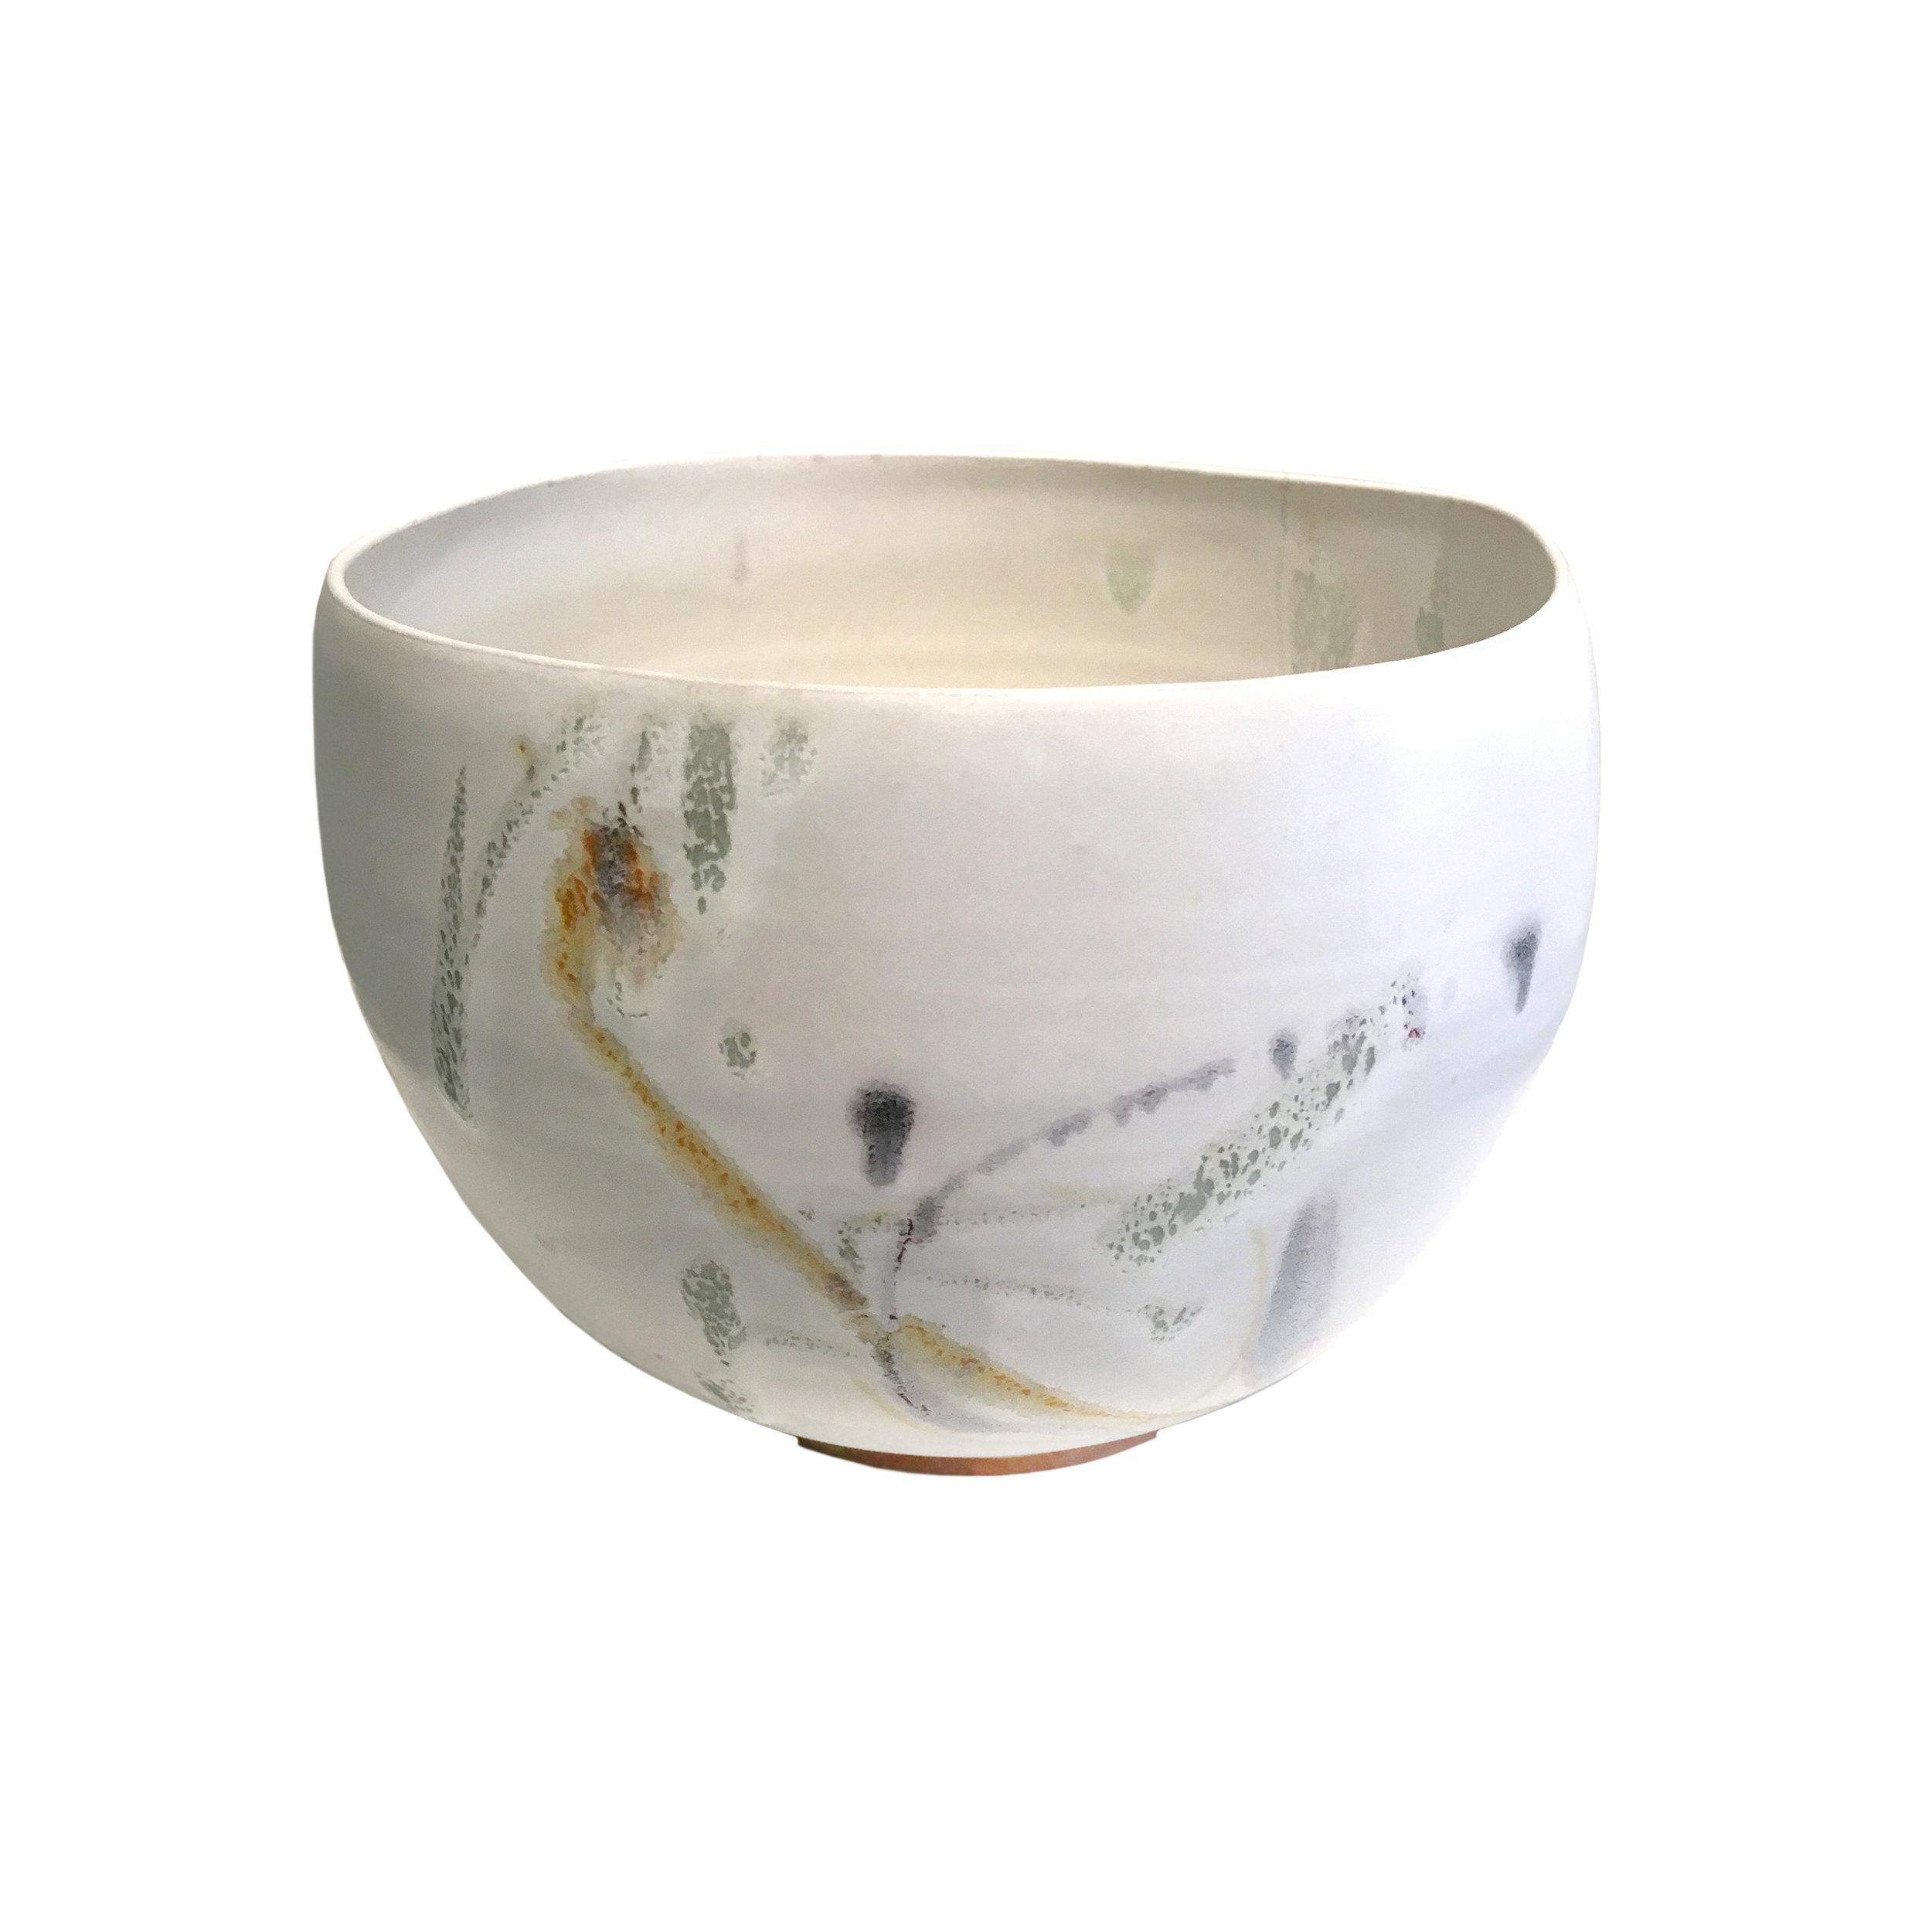 SOLD II White matte bowl